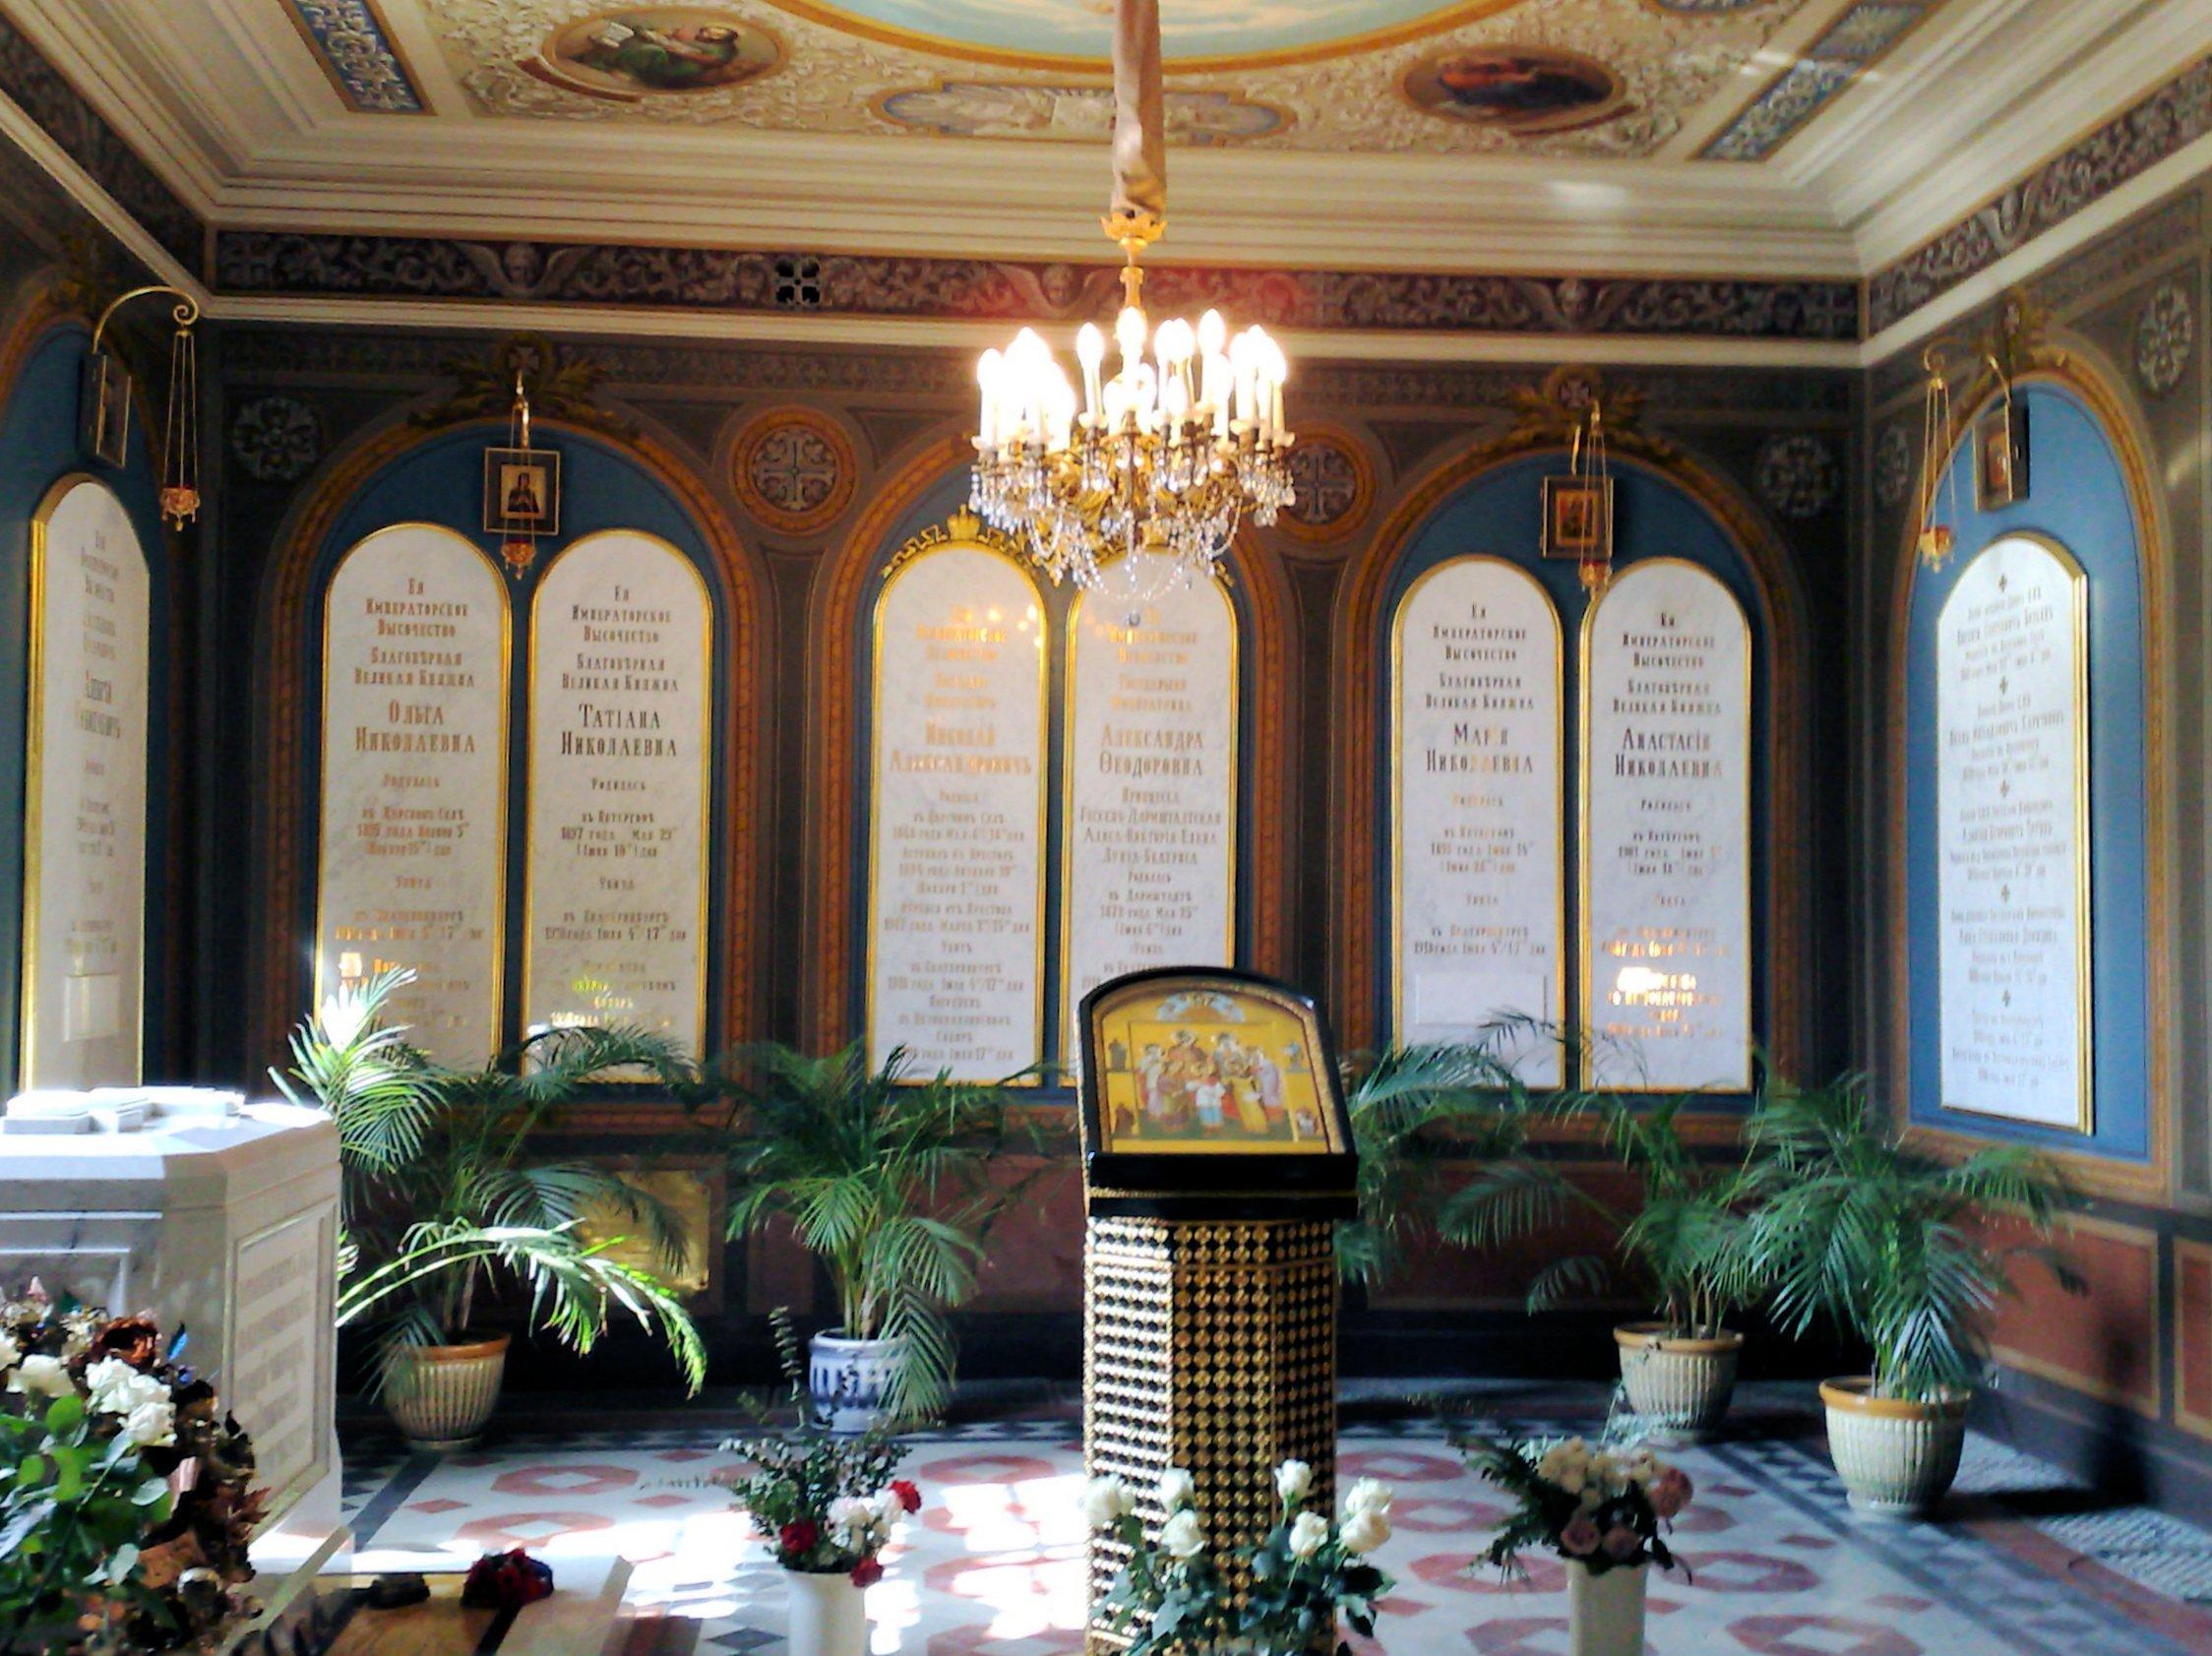 Romanov family tombs, russia photo